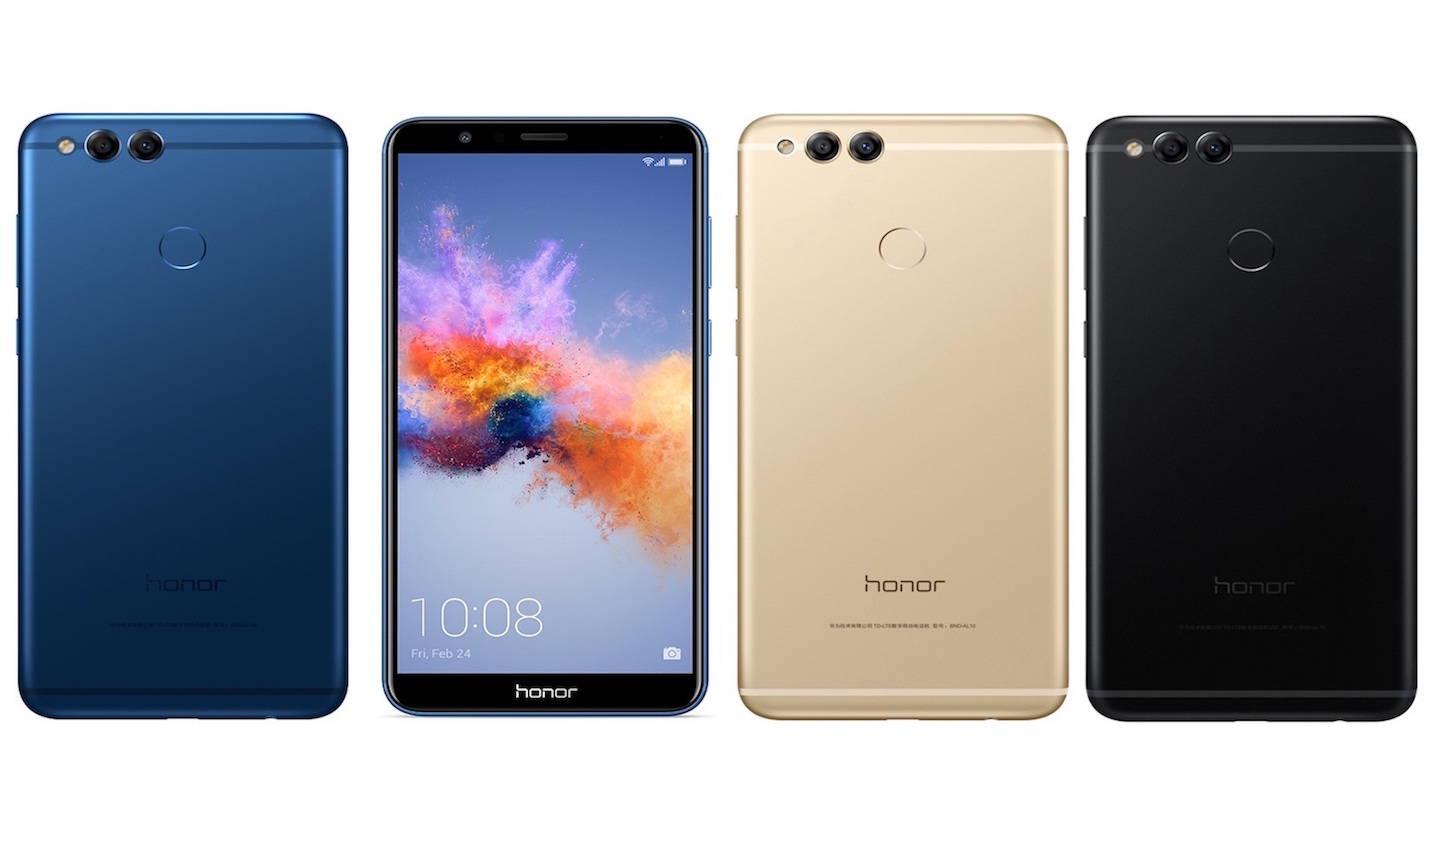 Huawei tuotteet